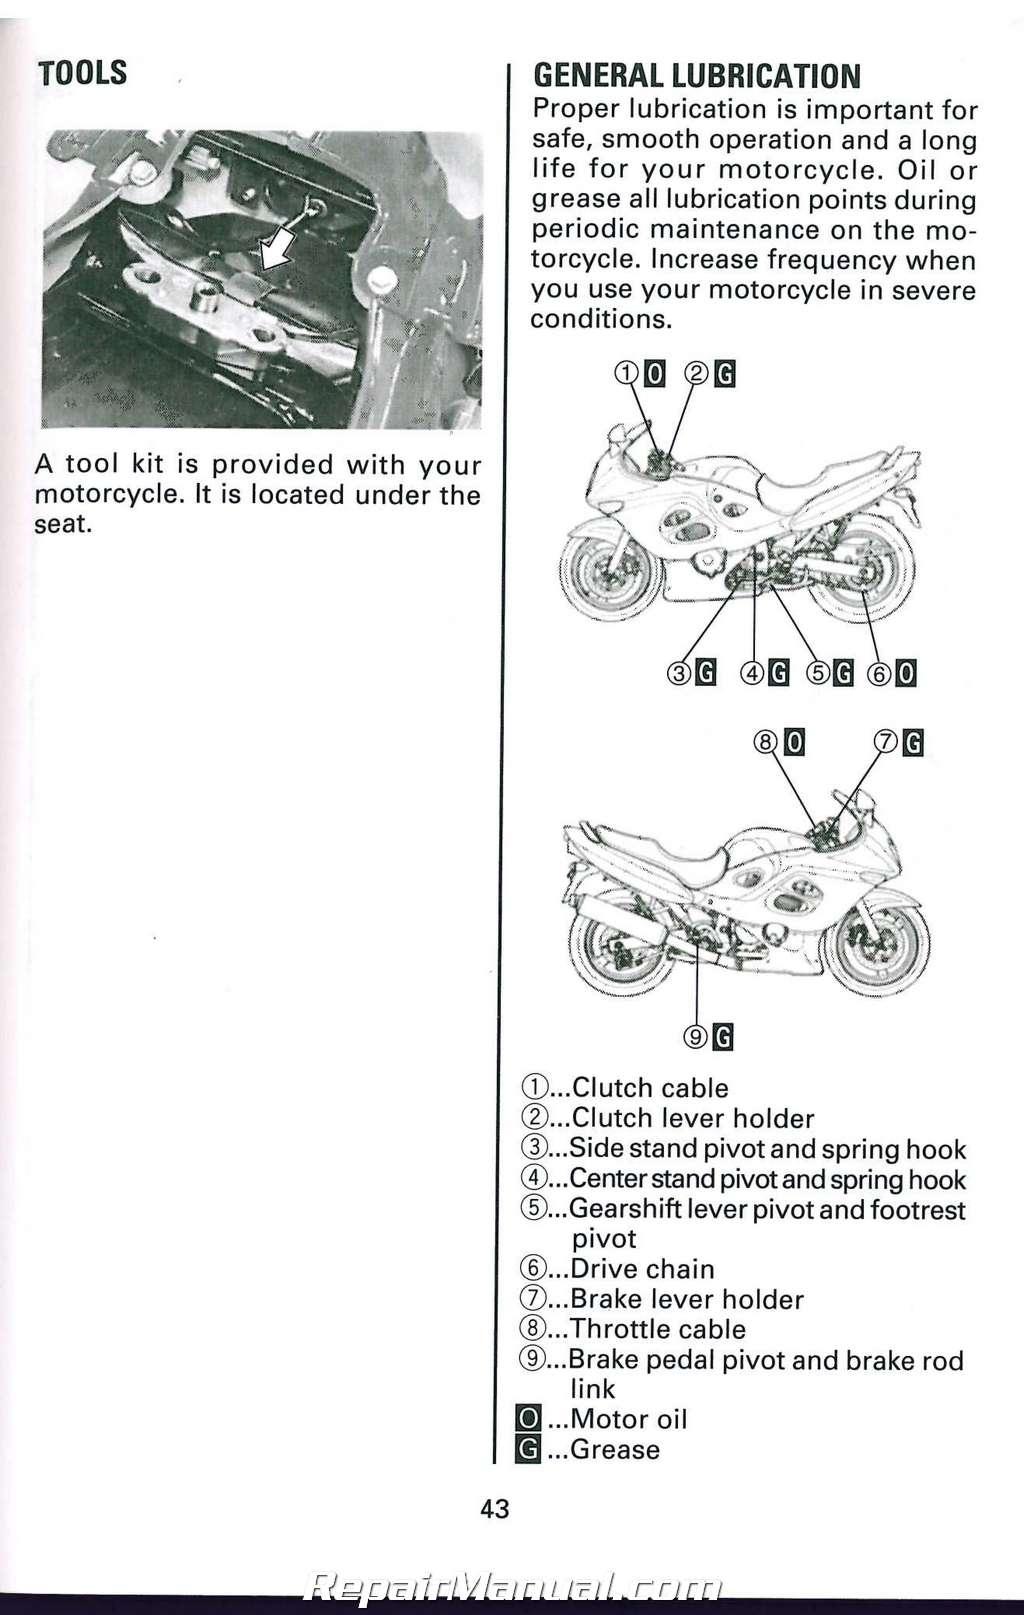 PDF 2000 suzuki katana 600 owners manual 28 pages suzuki gsx – Katana Gsx600f Engine Diagram